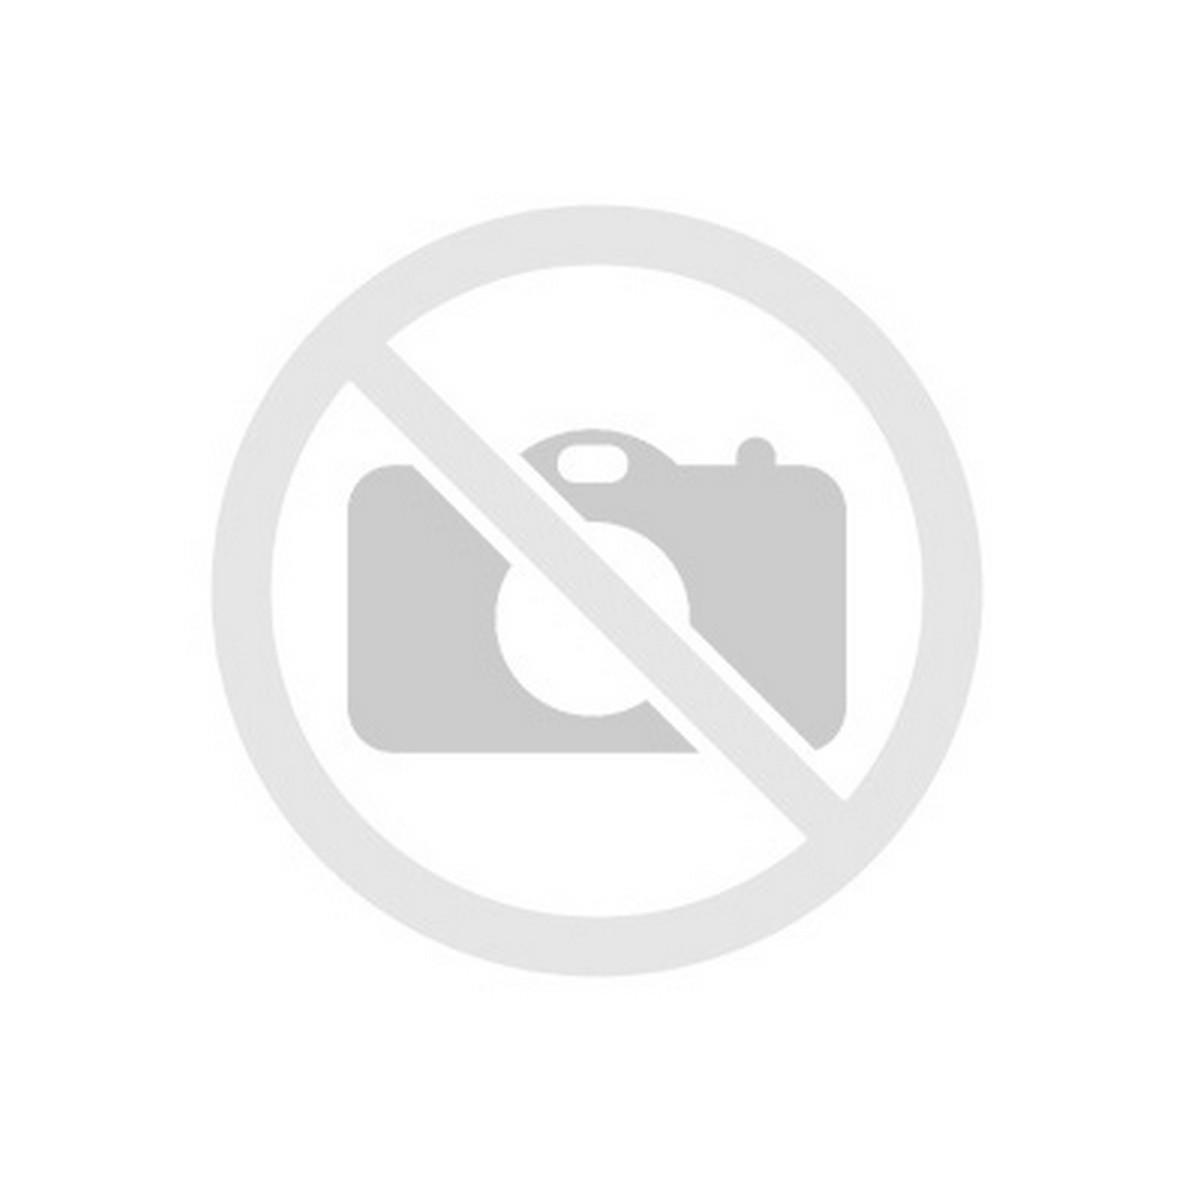 Wind Blade BlackFox TT-1 TELE 100-200гр